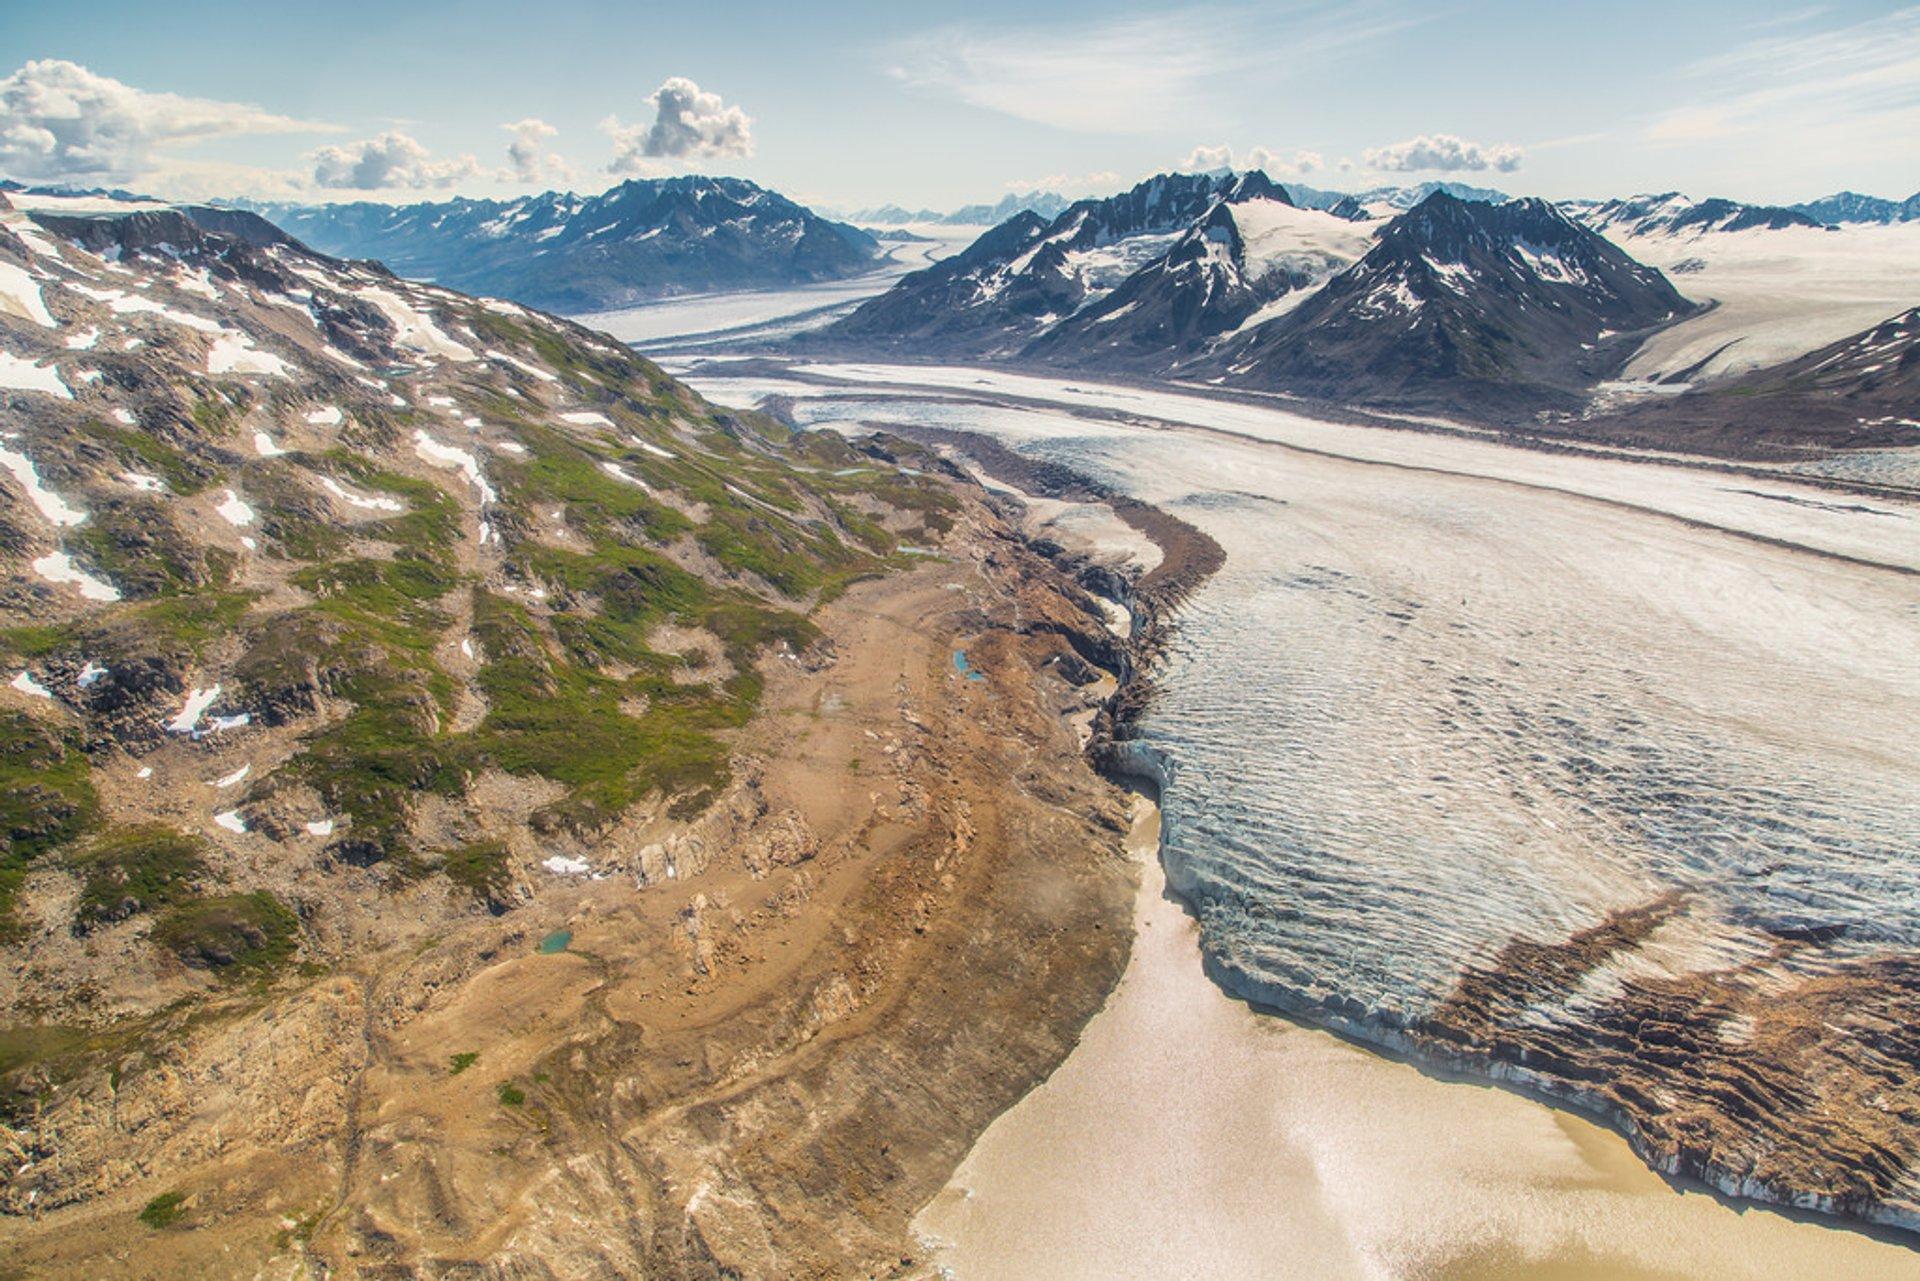 Tana Glacier 2020